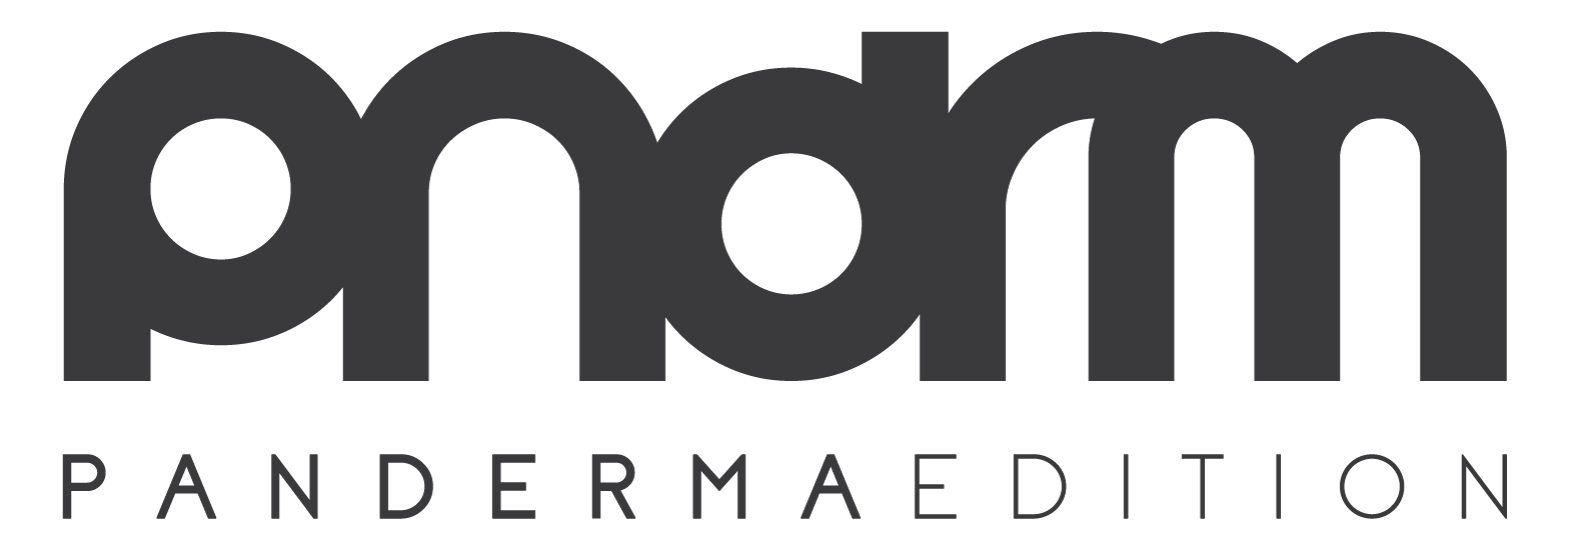 Panderma logó